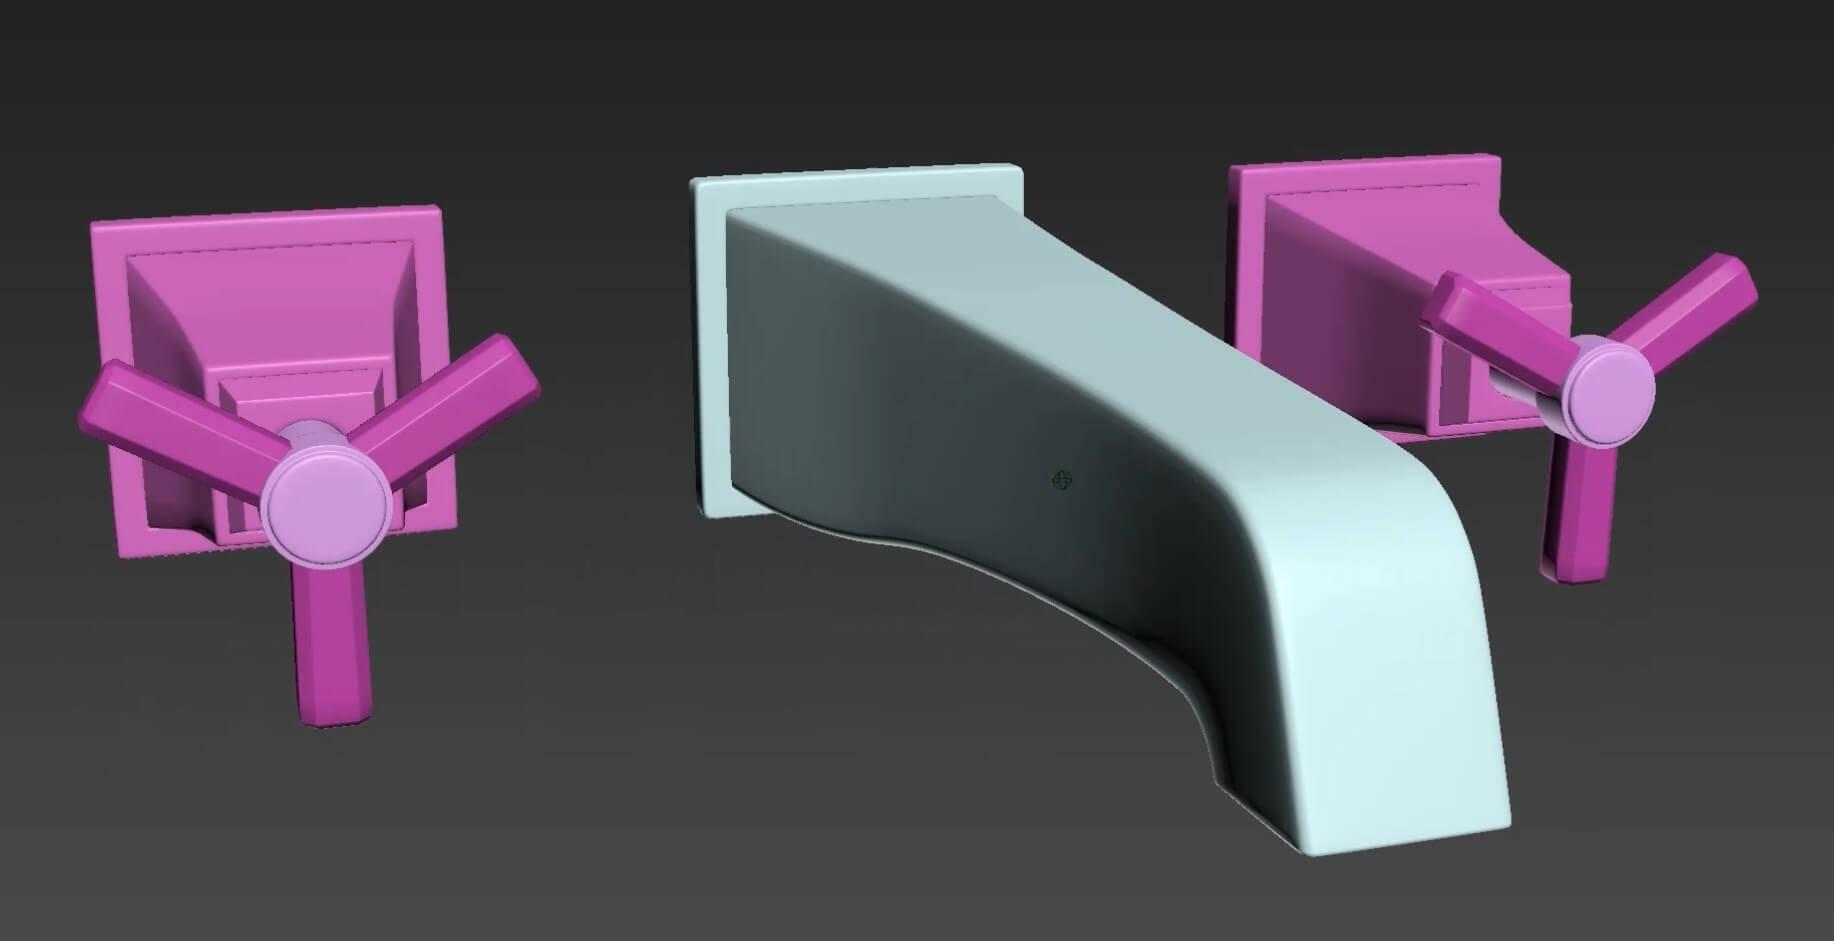 3d моделирование смесителя для ванны Devon&Devon 2TIME233MCR в 3dsMax